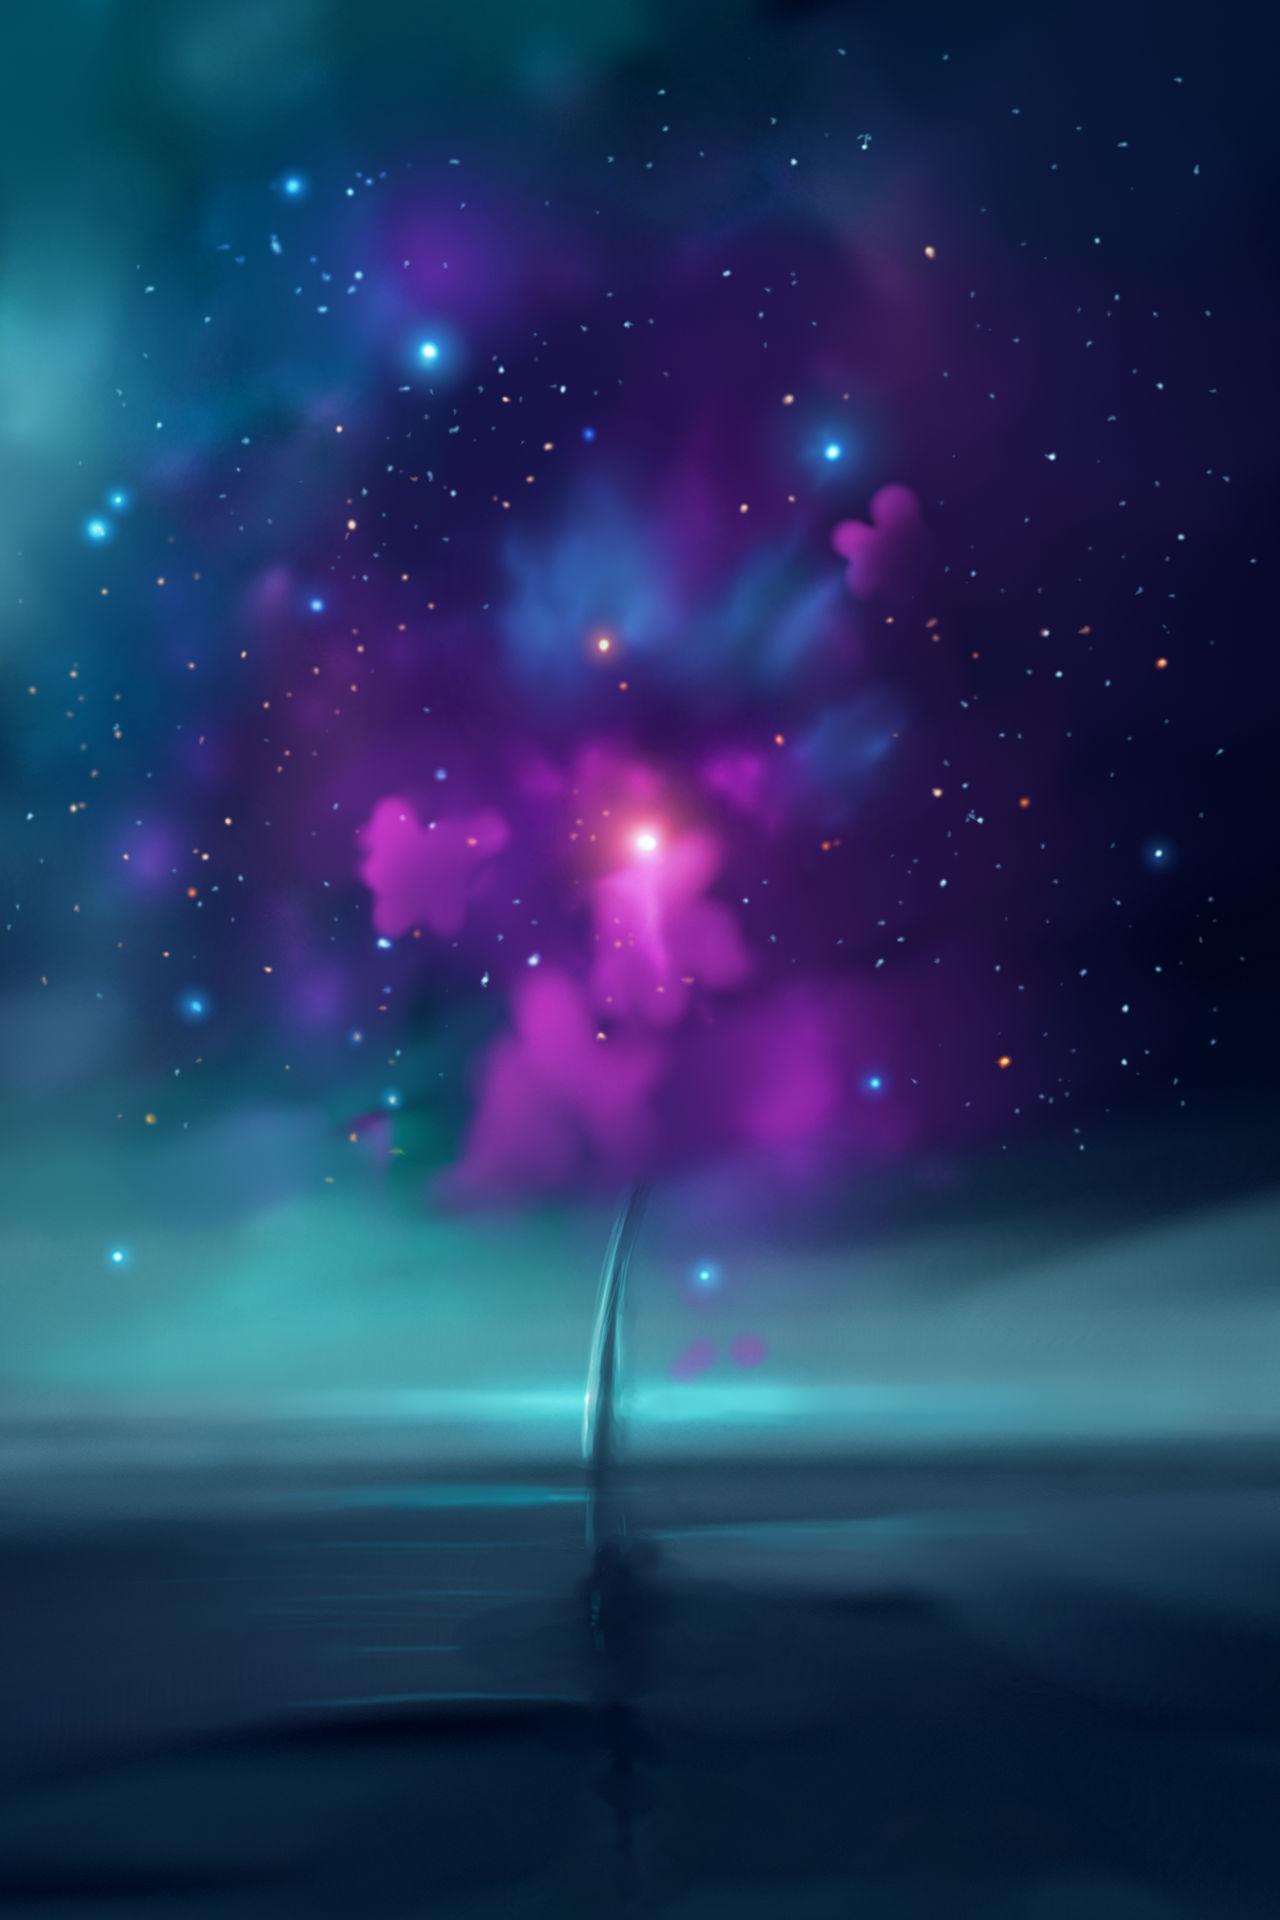 M20 Surreal Trifid Nebula